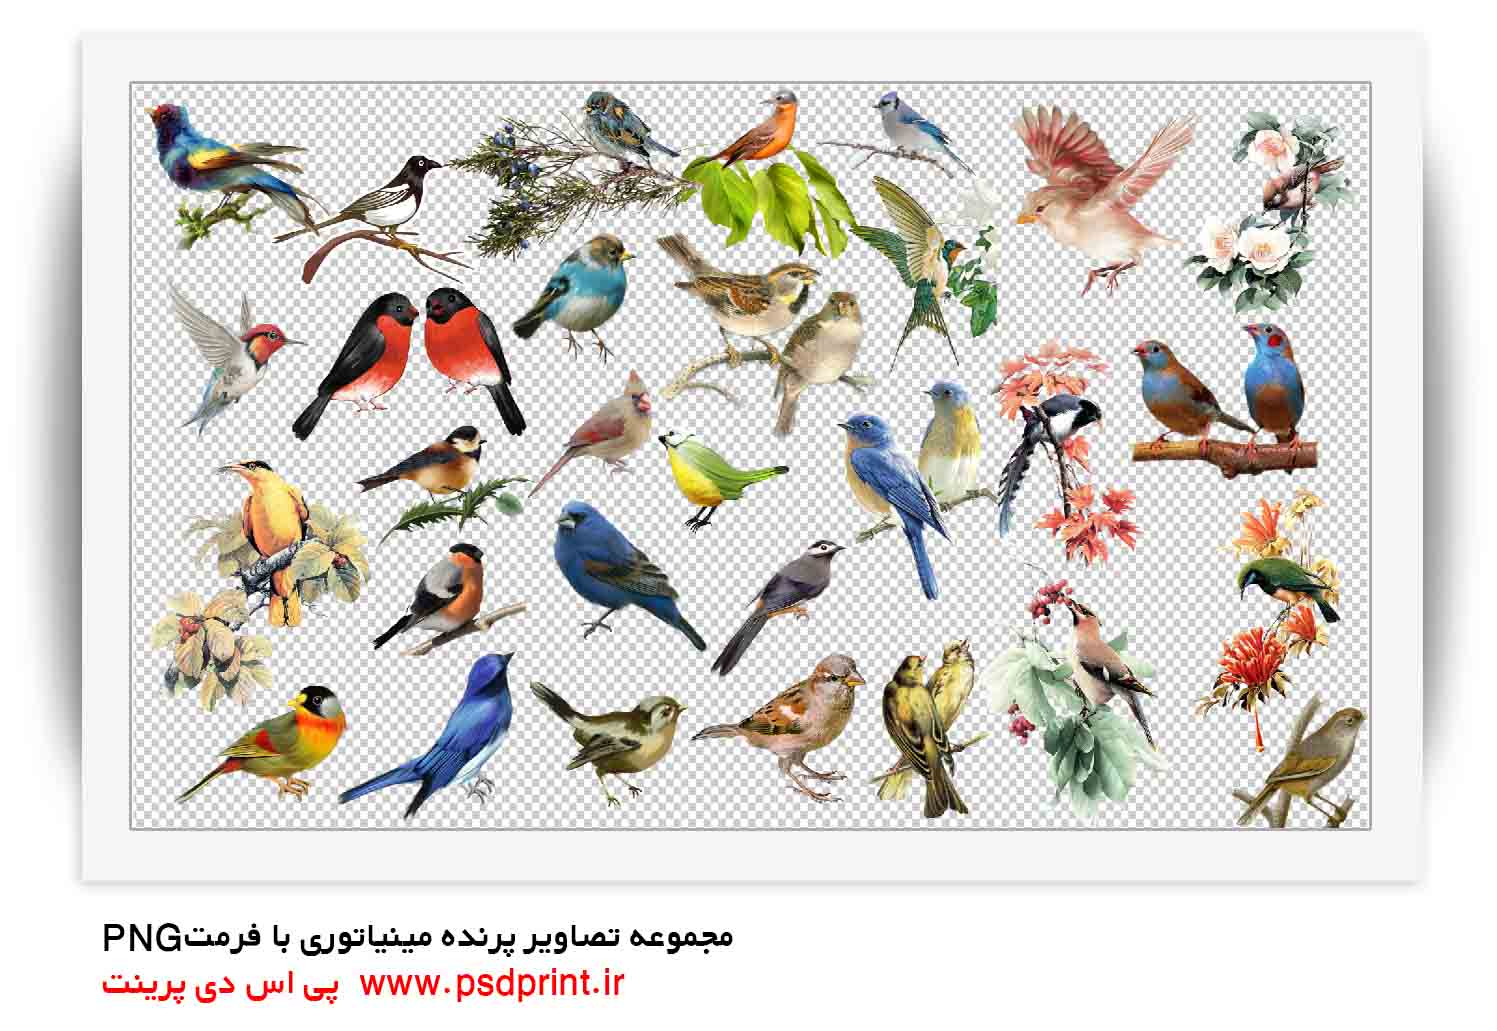 پرنده شیک طراحی png